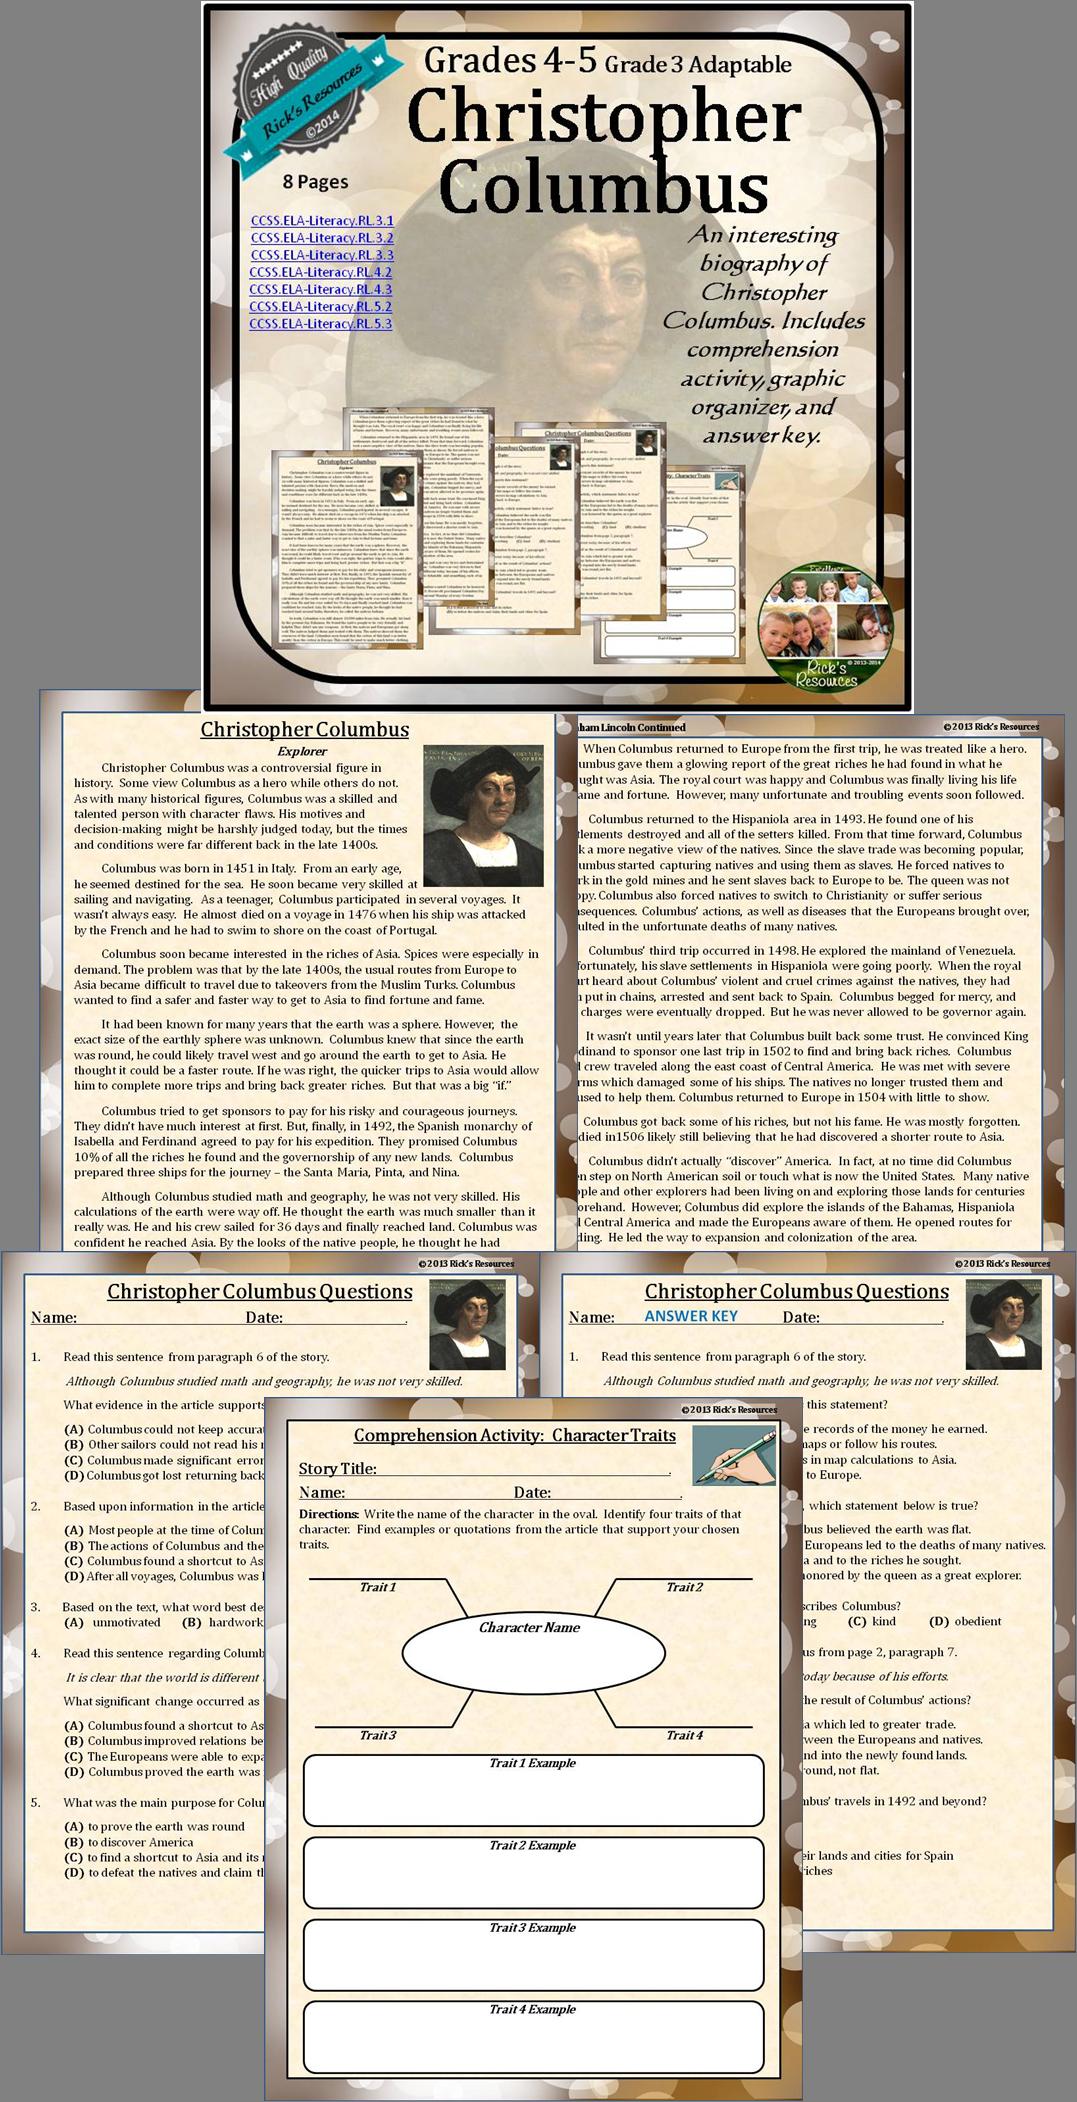 Christopher Columbus Biography Reading Comprehension Print and Digital  Versions   Social studies classroom [ 2102 x 1077 Pixel ]